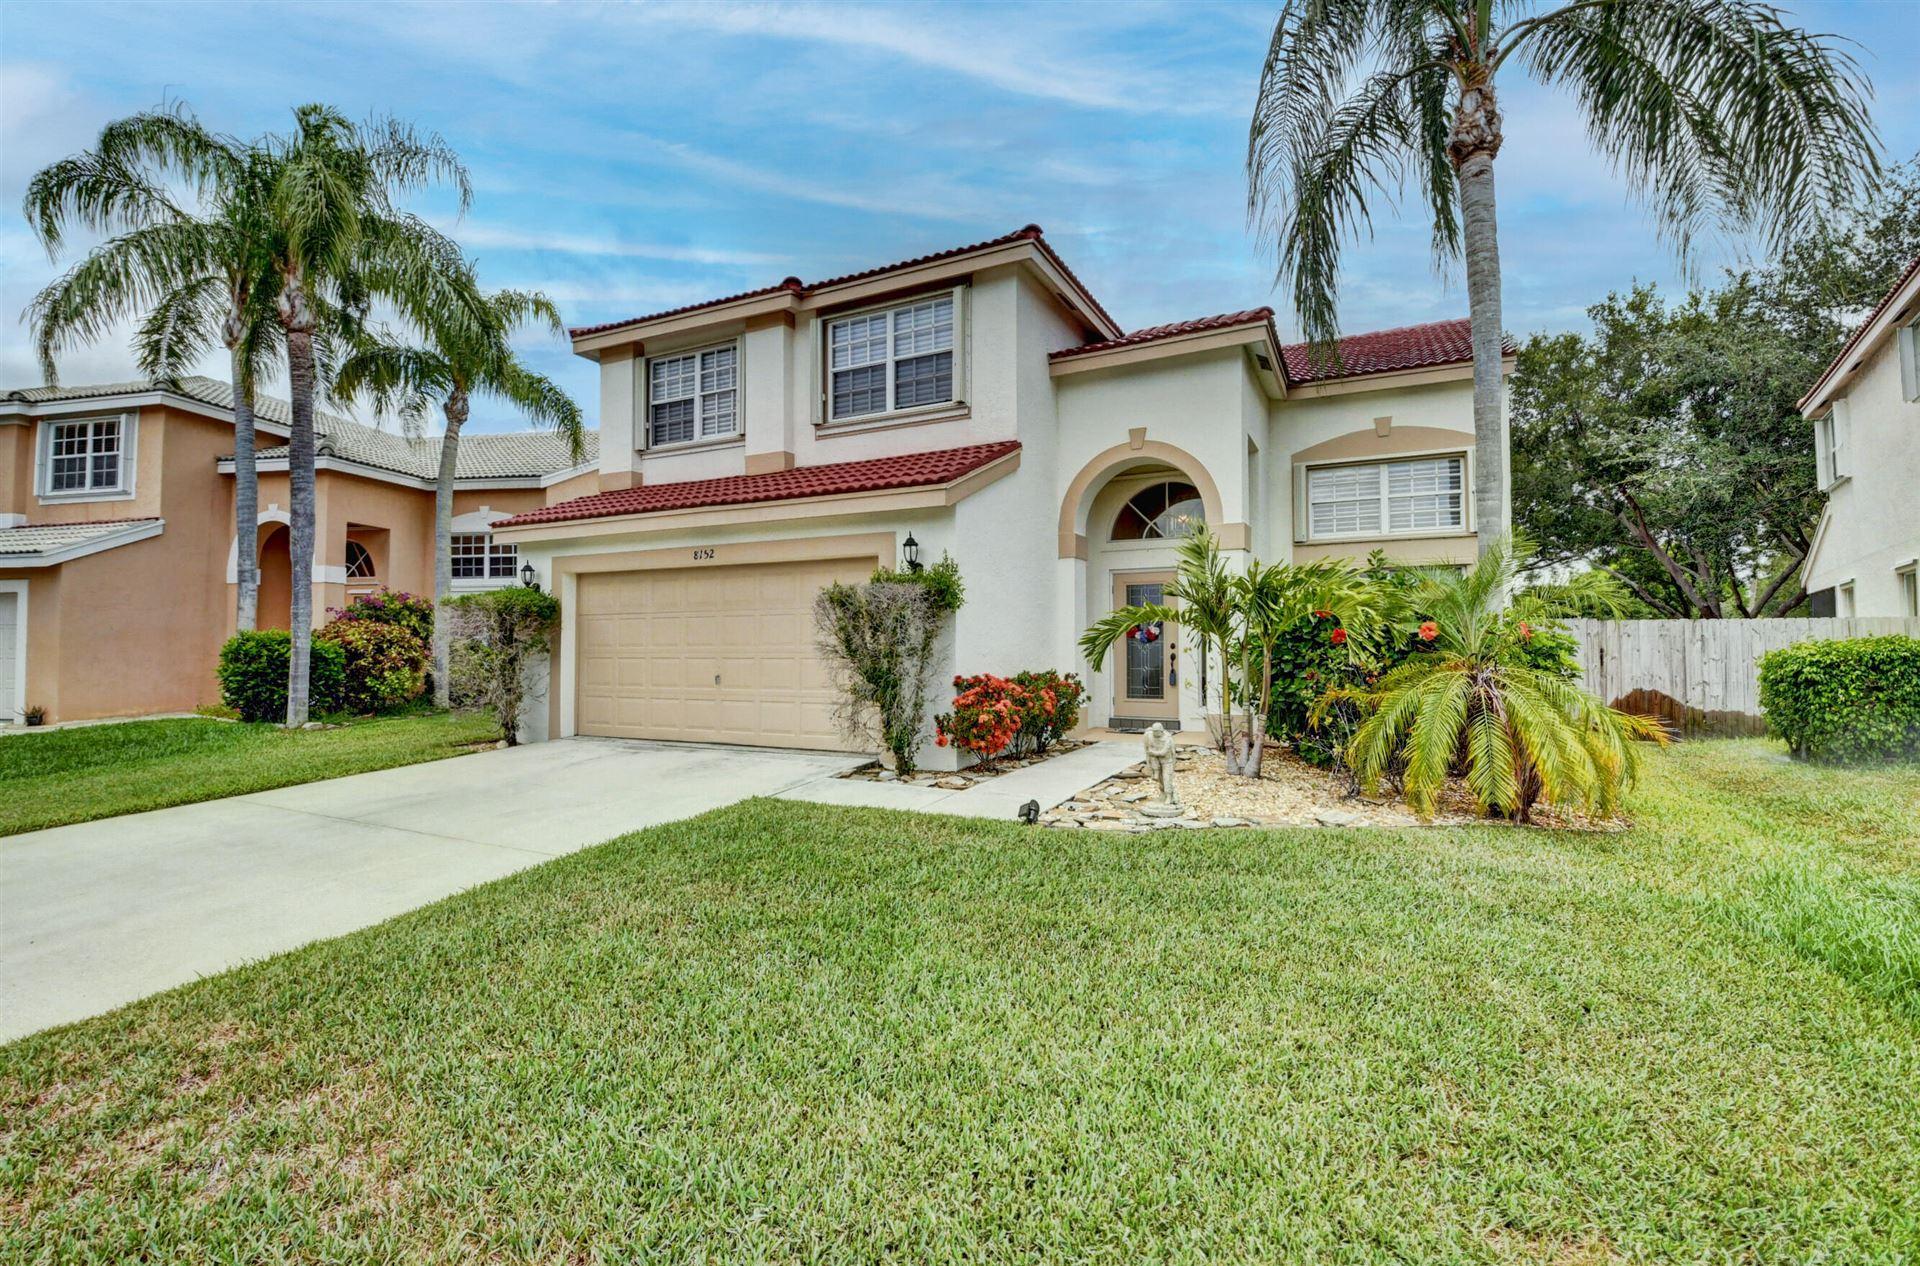 8152 Mystic Harbor Circle, Boynton Beach, FL 33436 - MLS#: RX-10719857